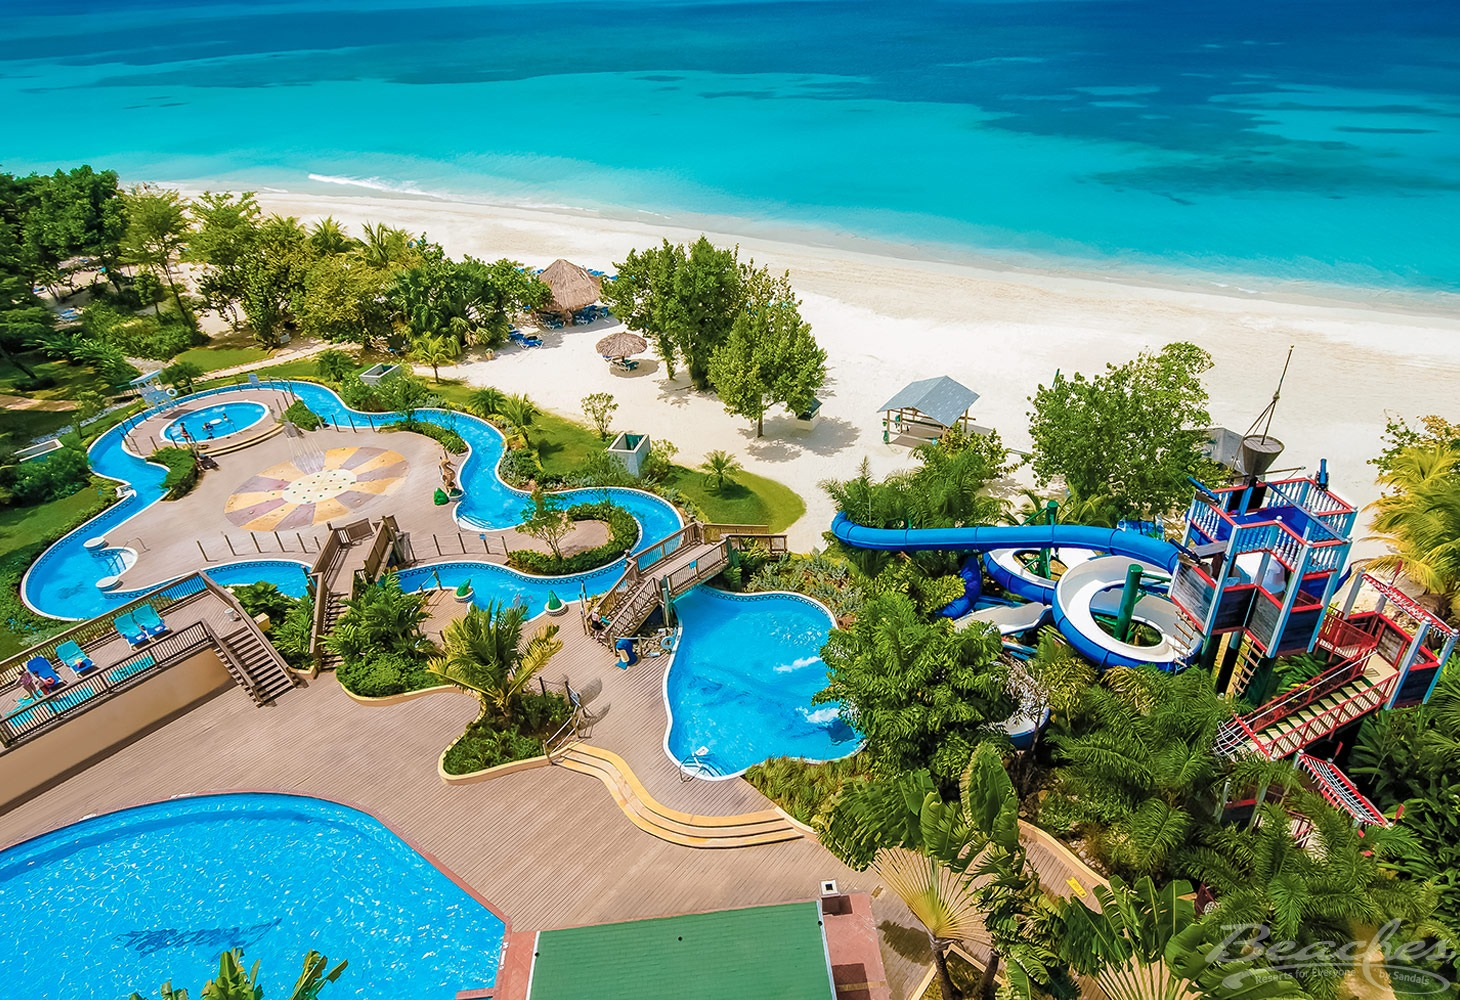 Beaches Resort Negril Water Park and Beach